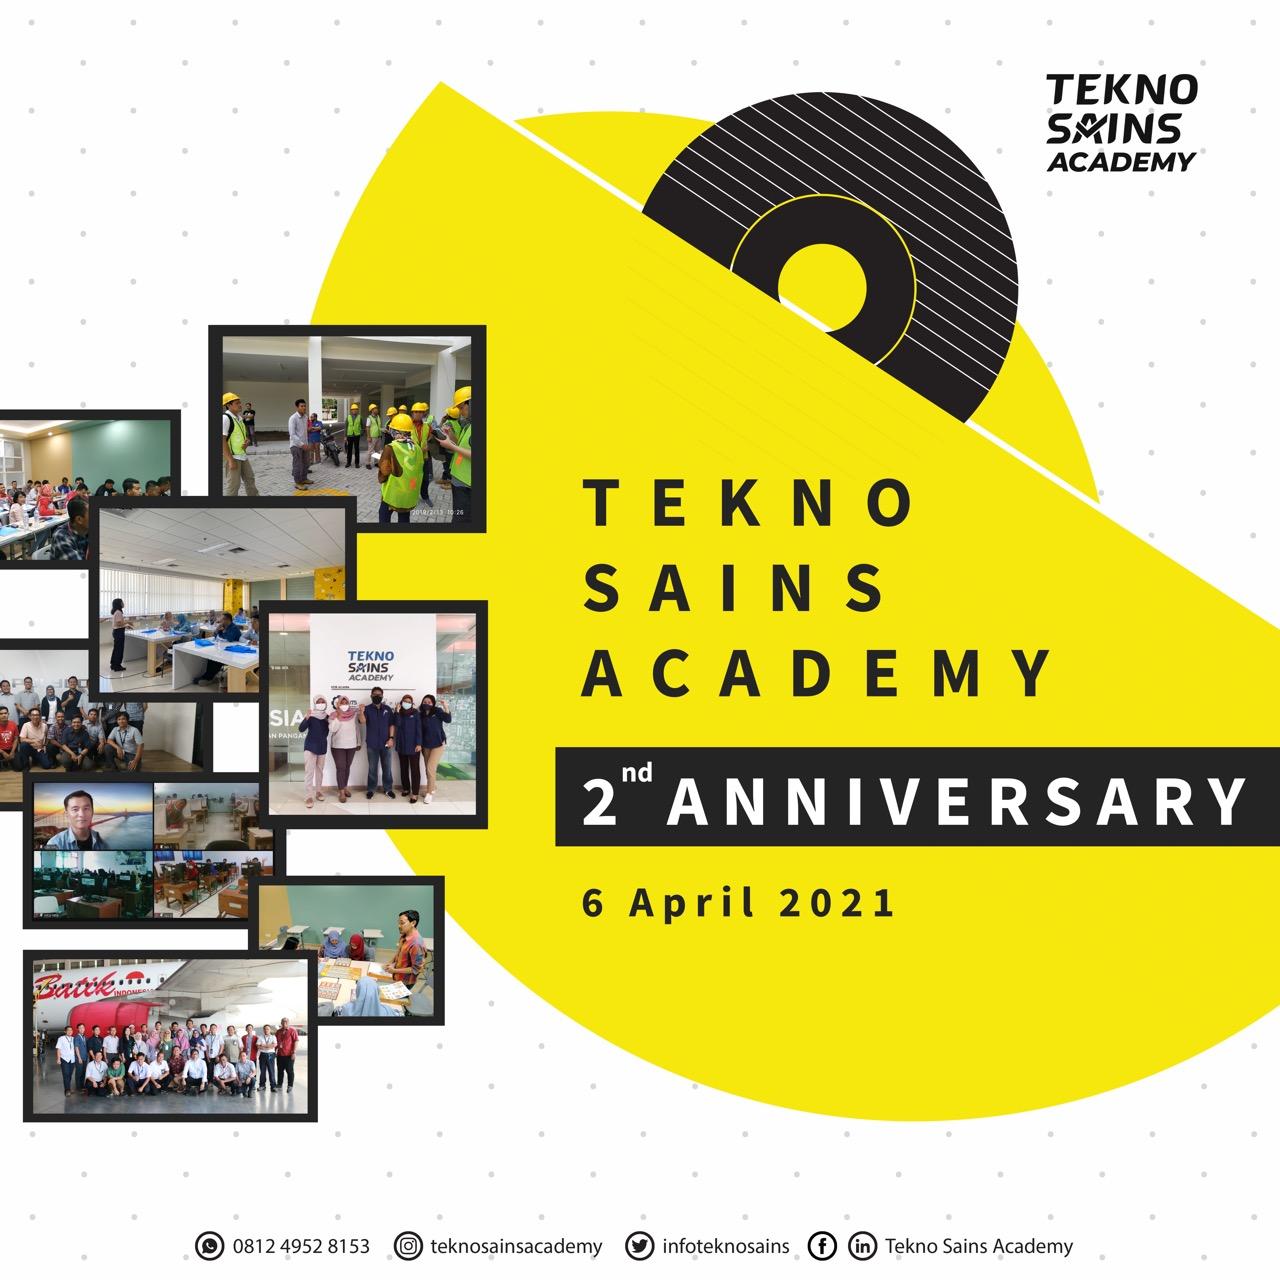 Tekno Sains Academy